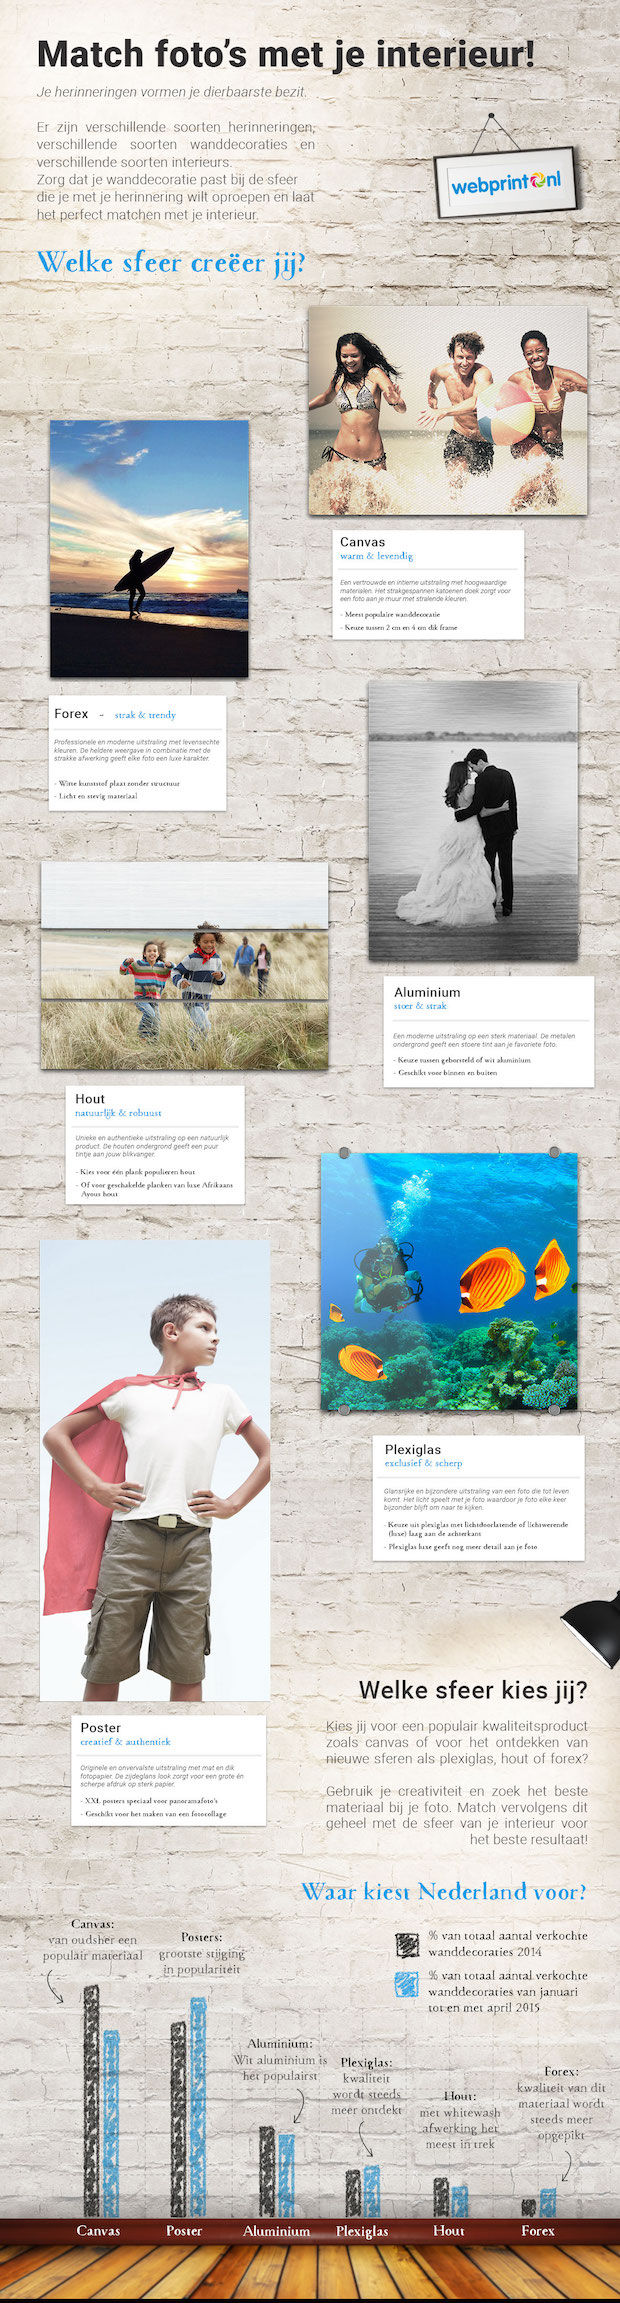 infographic_foto's